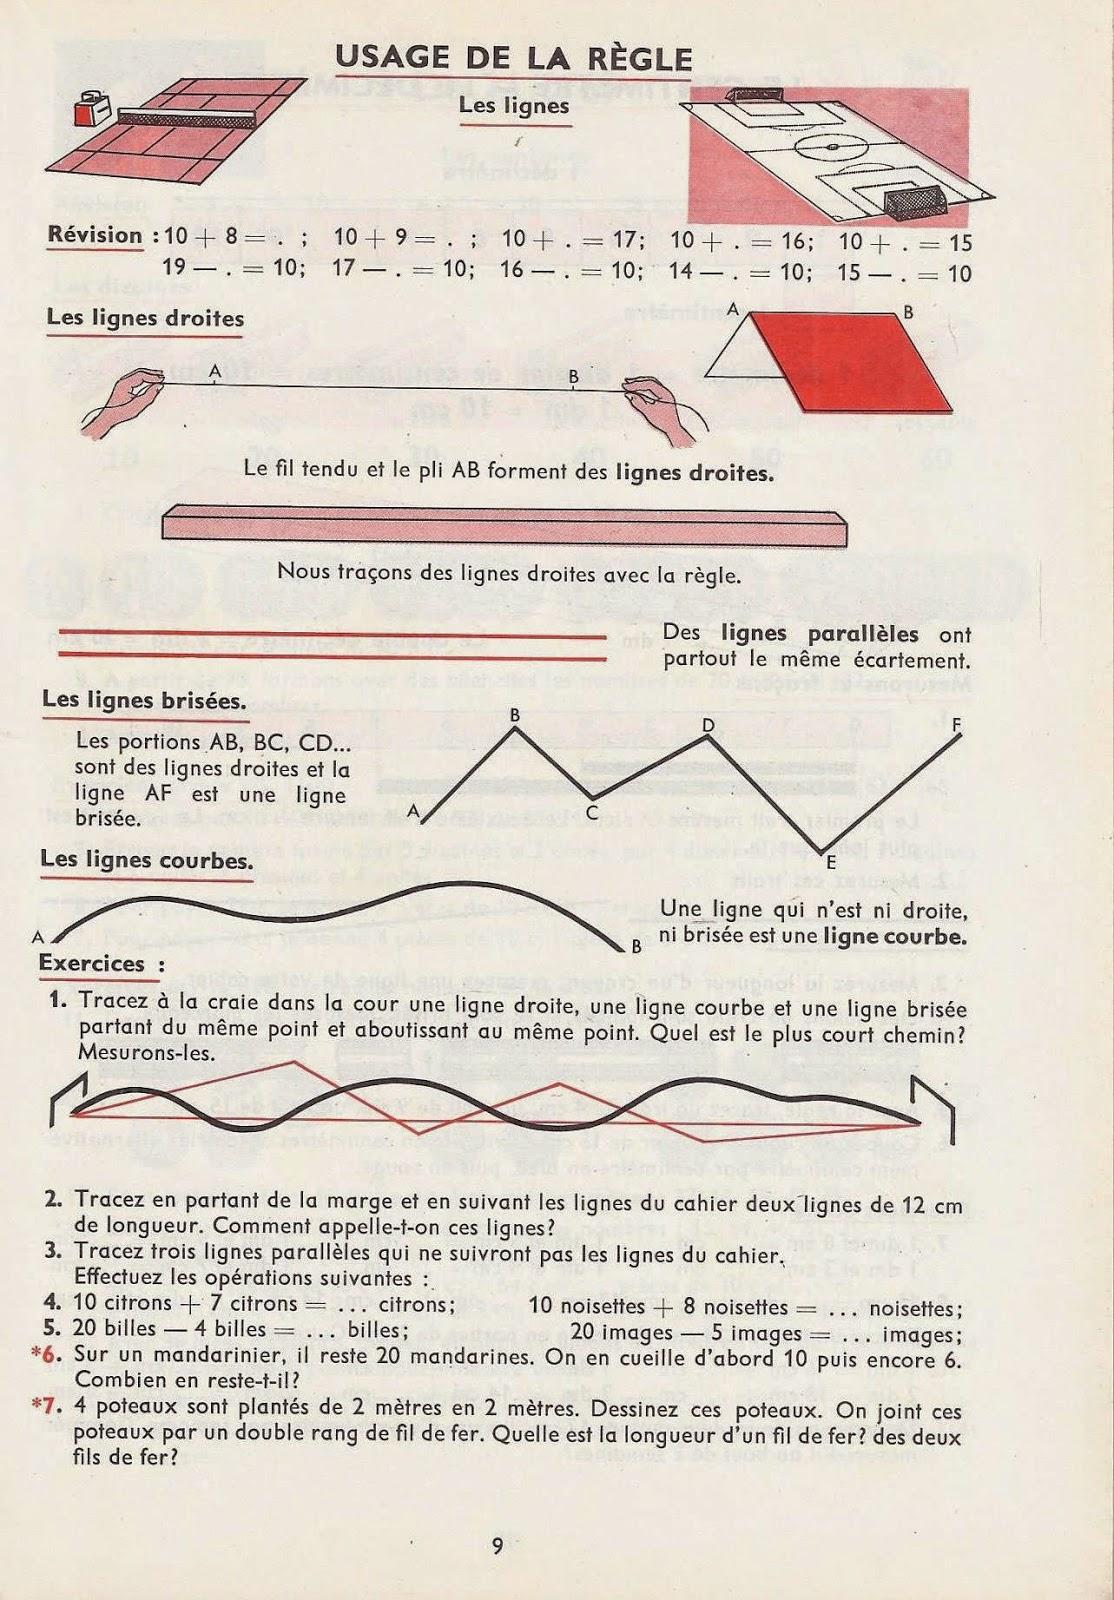 manuels anciens  bodard  conti  le calcul quotidien ce1